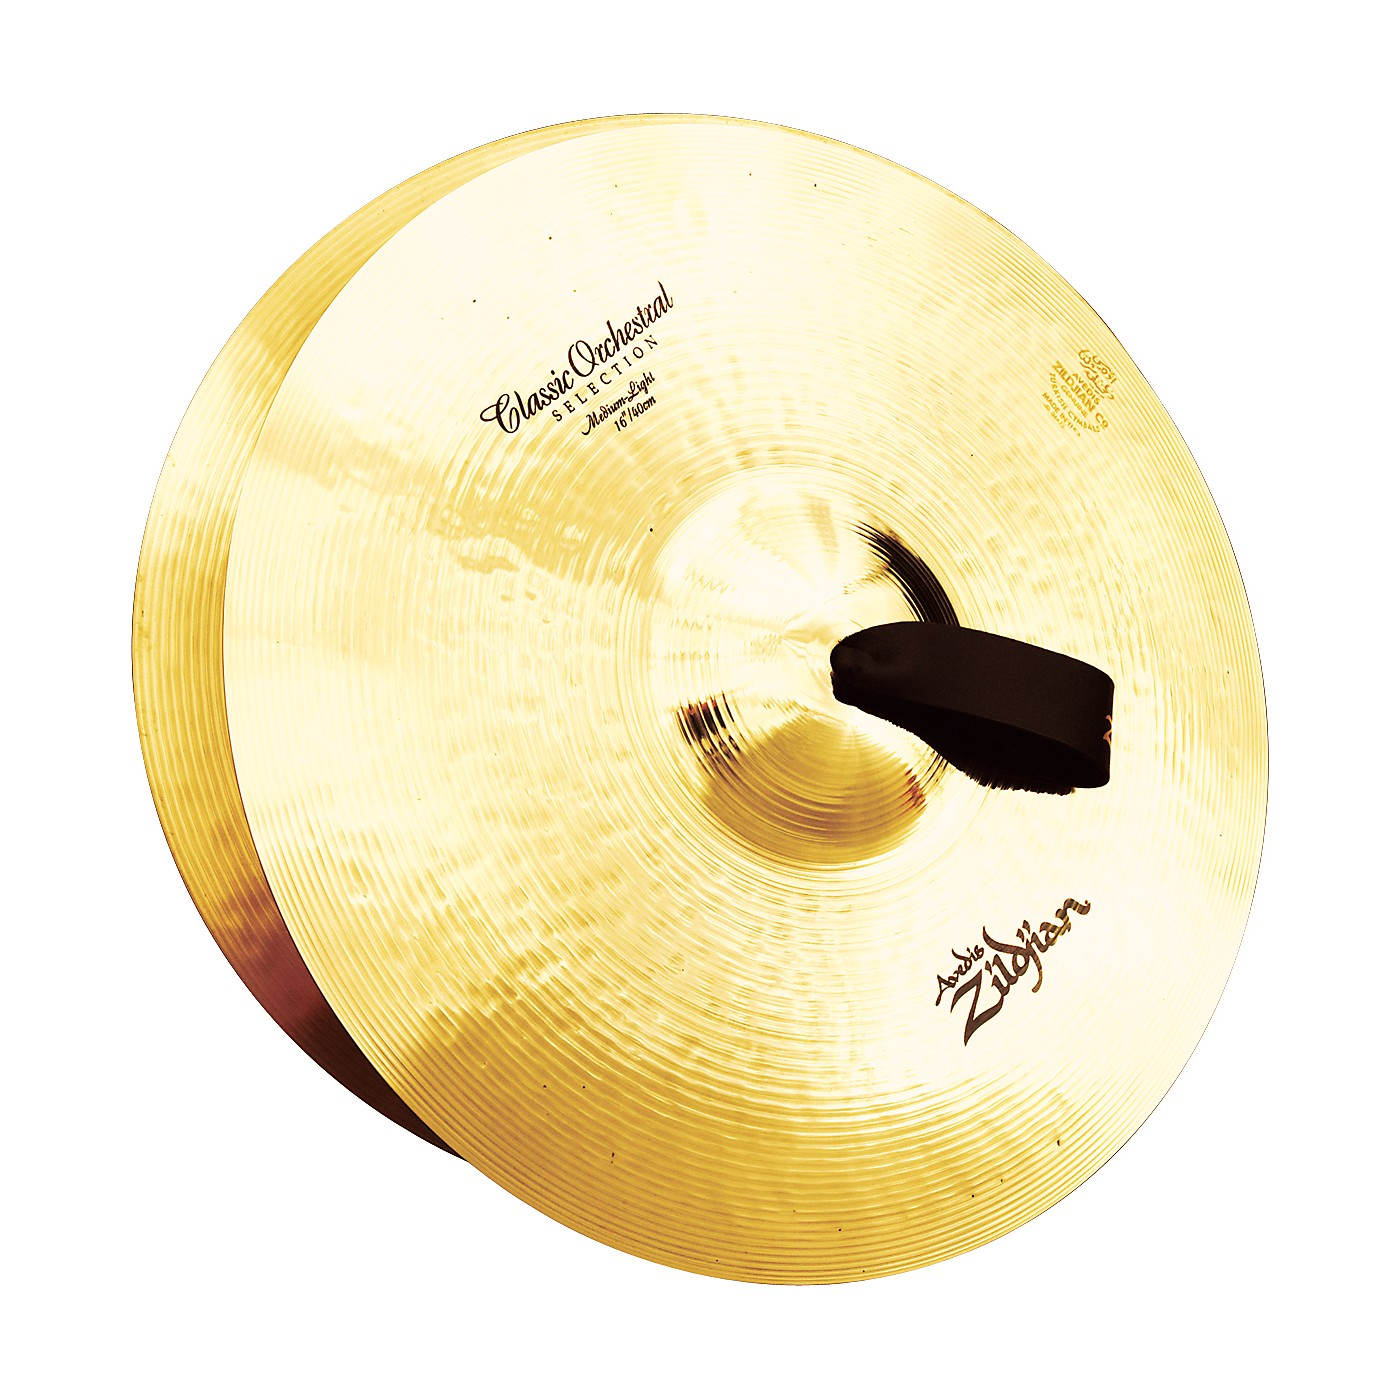 Zildjian A Classic Orchestral Medium Light Crash Cymbal Pair thumbnail